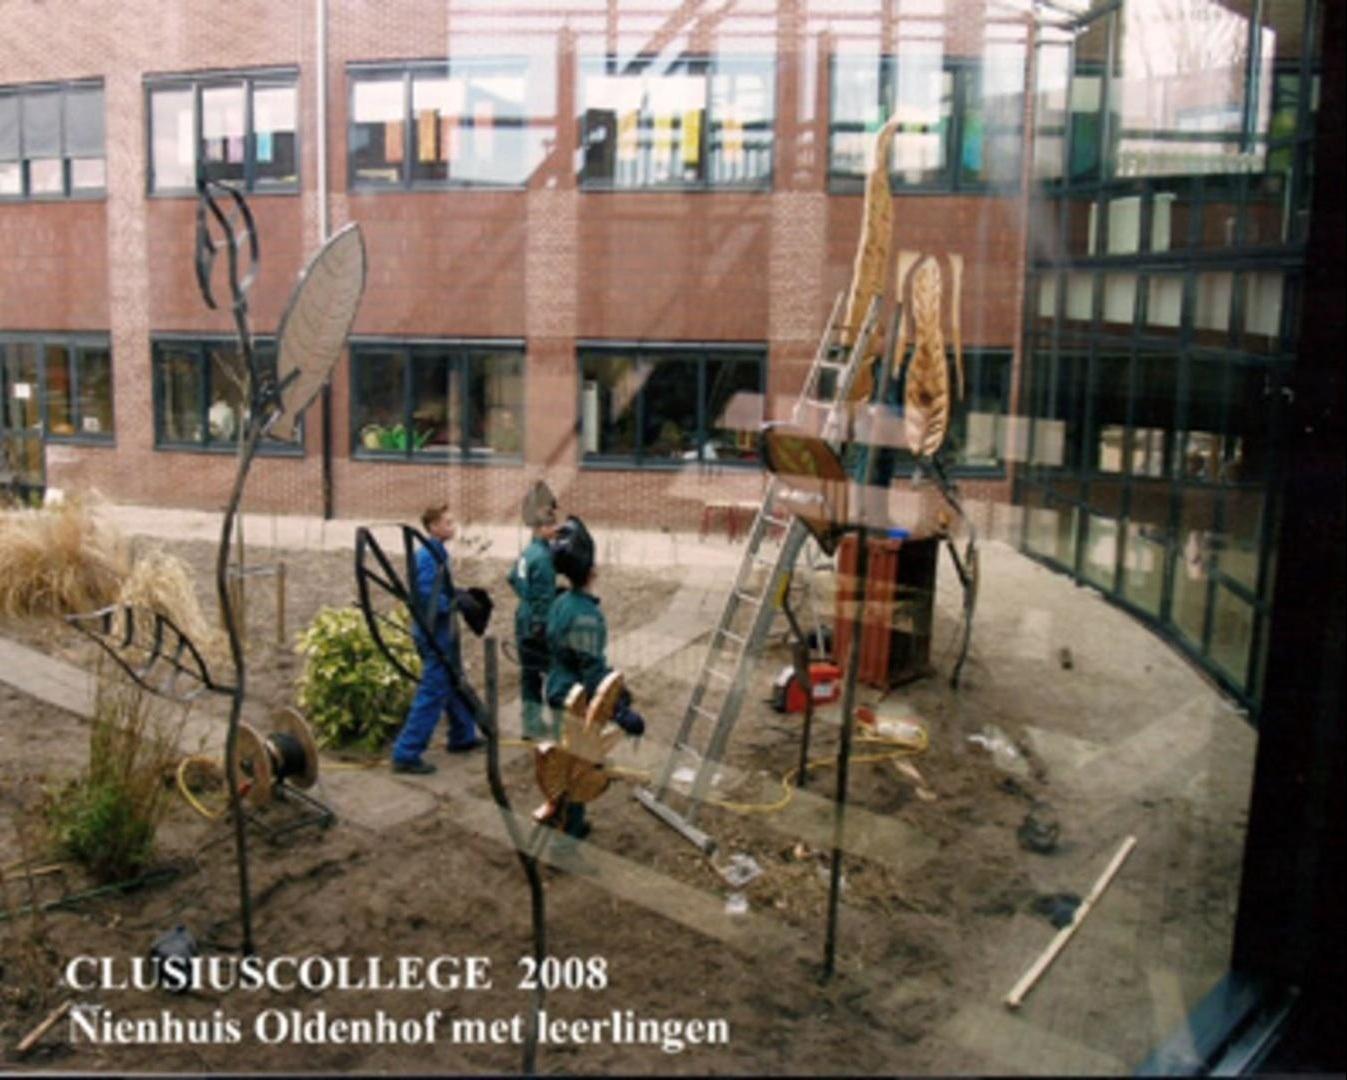 clusiuscollege 2008.jpg